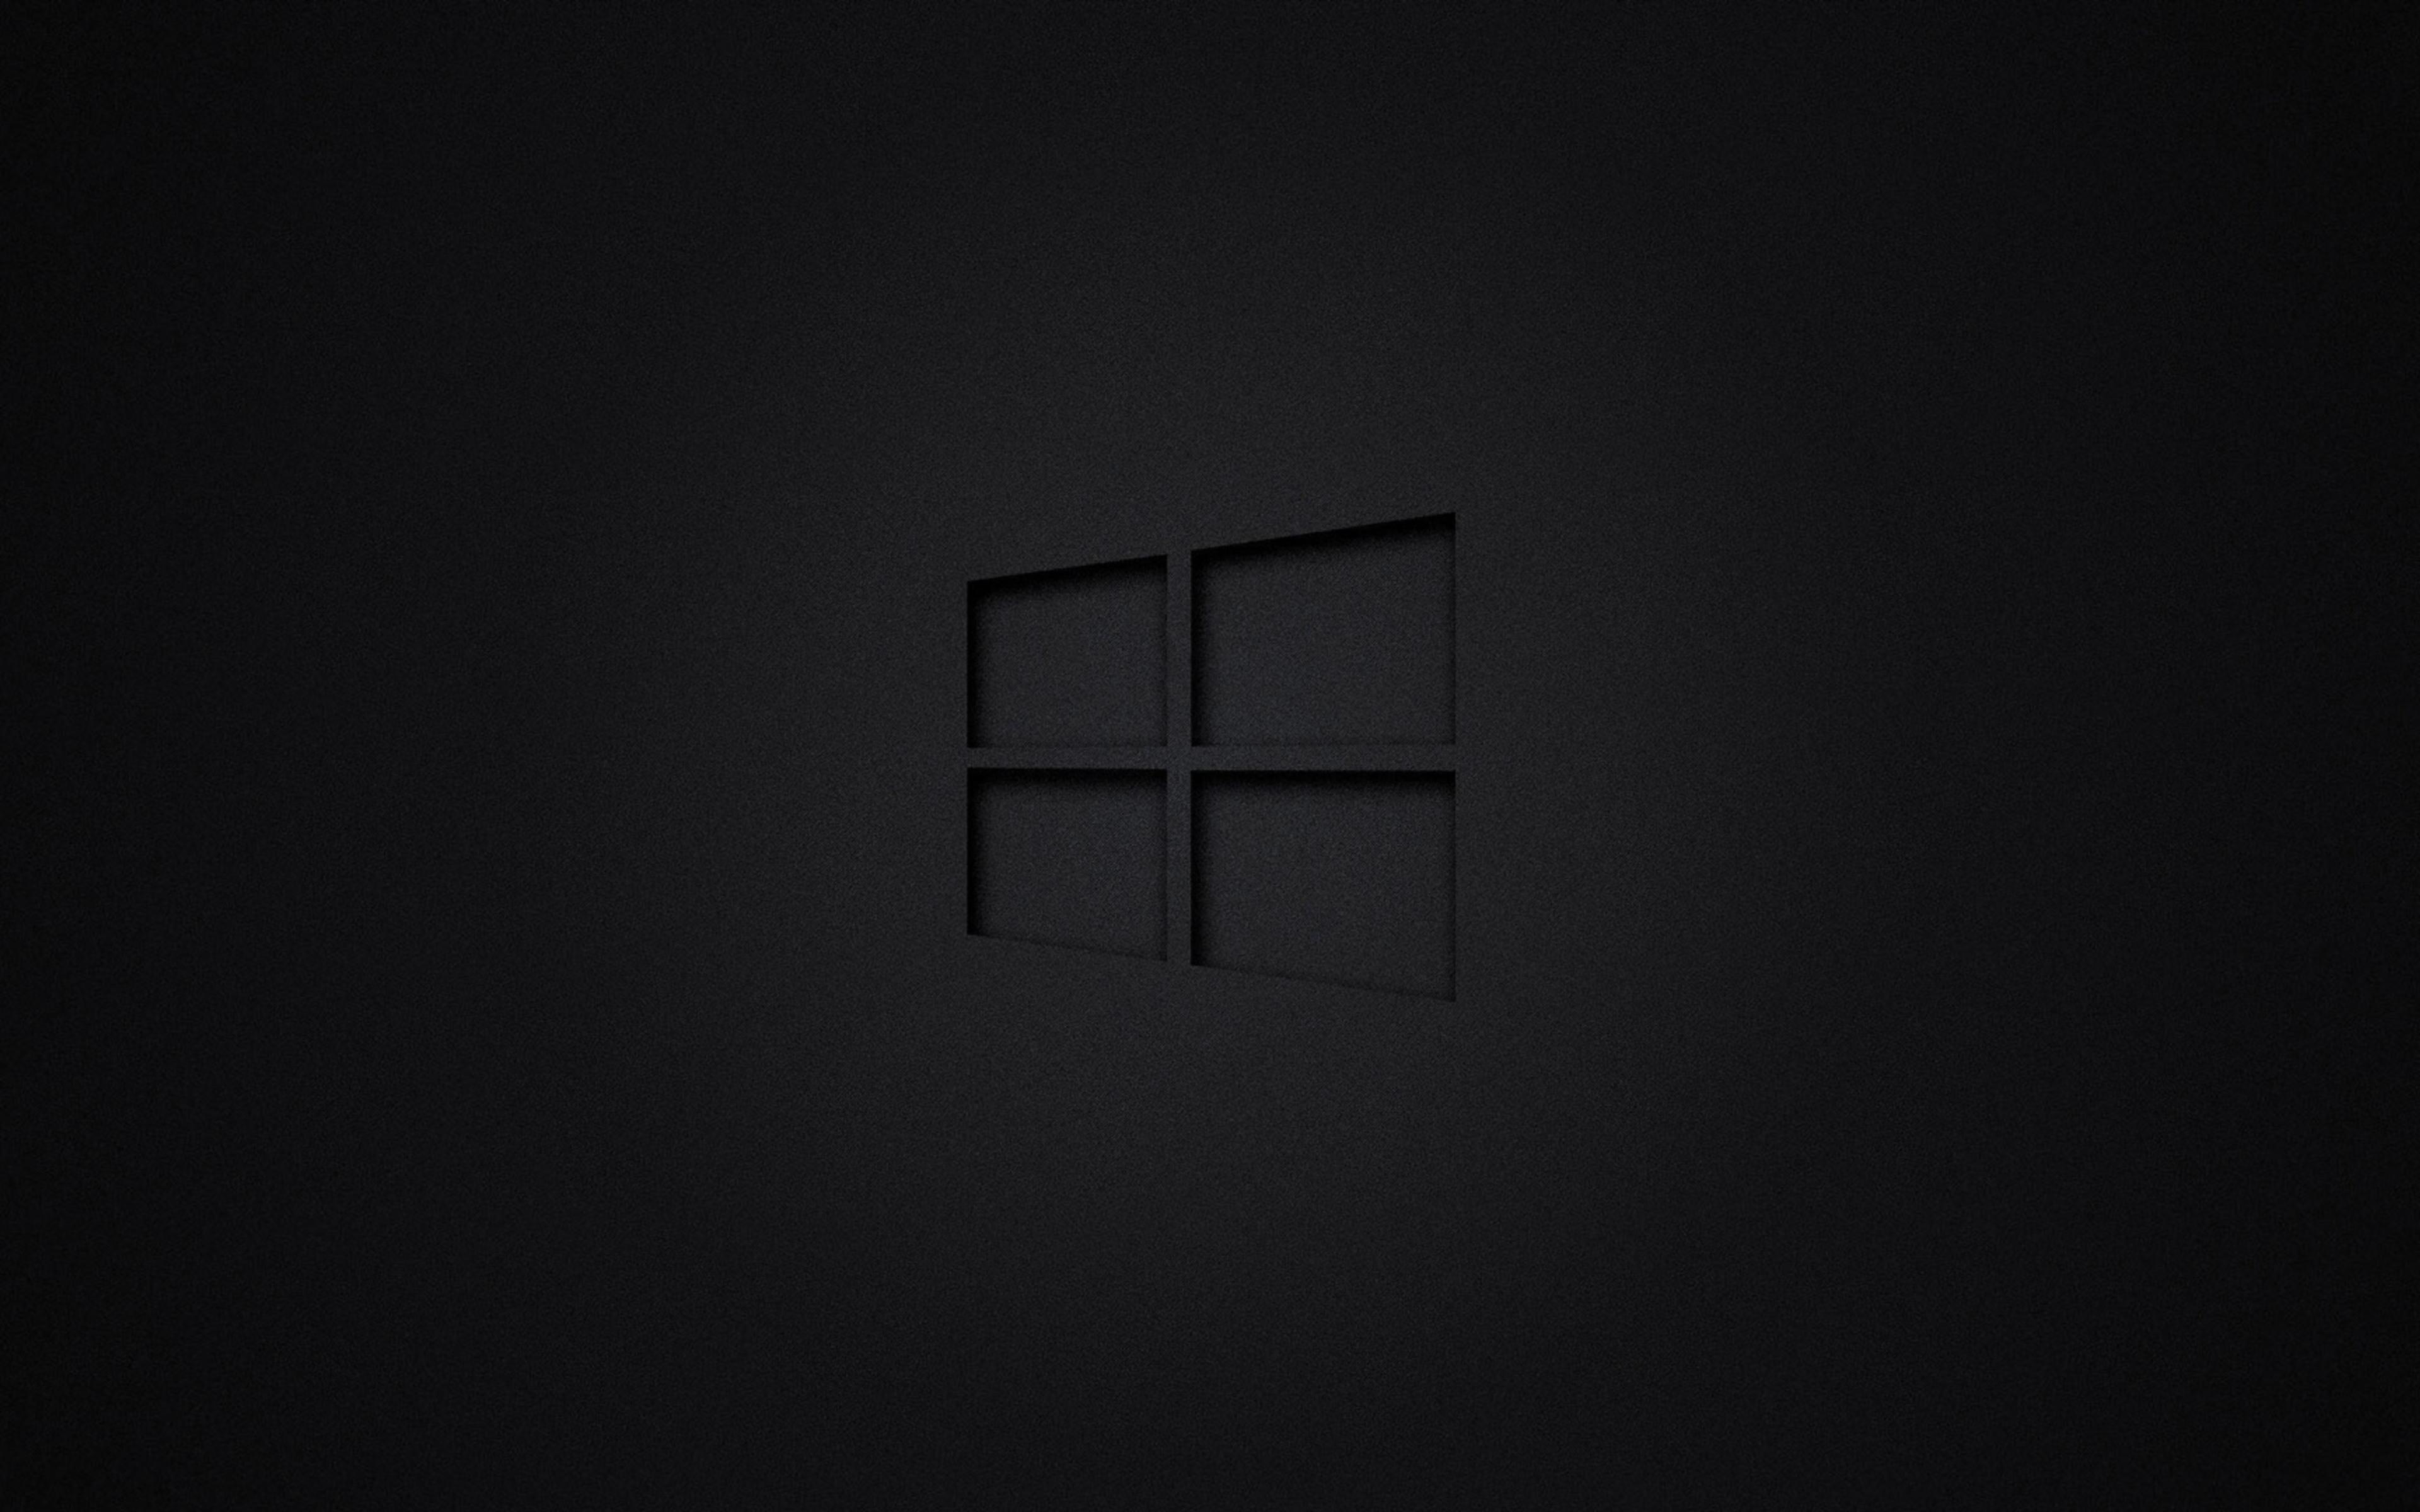 Windows  Dark To Jpg